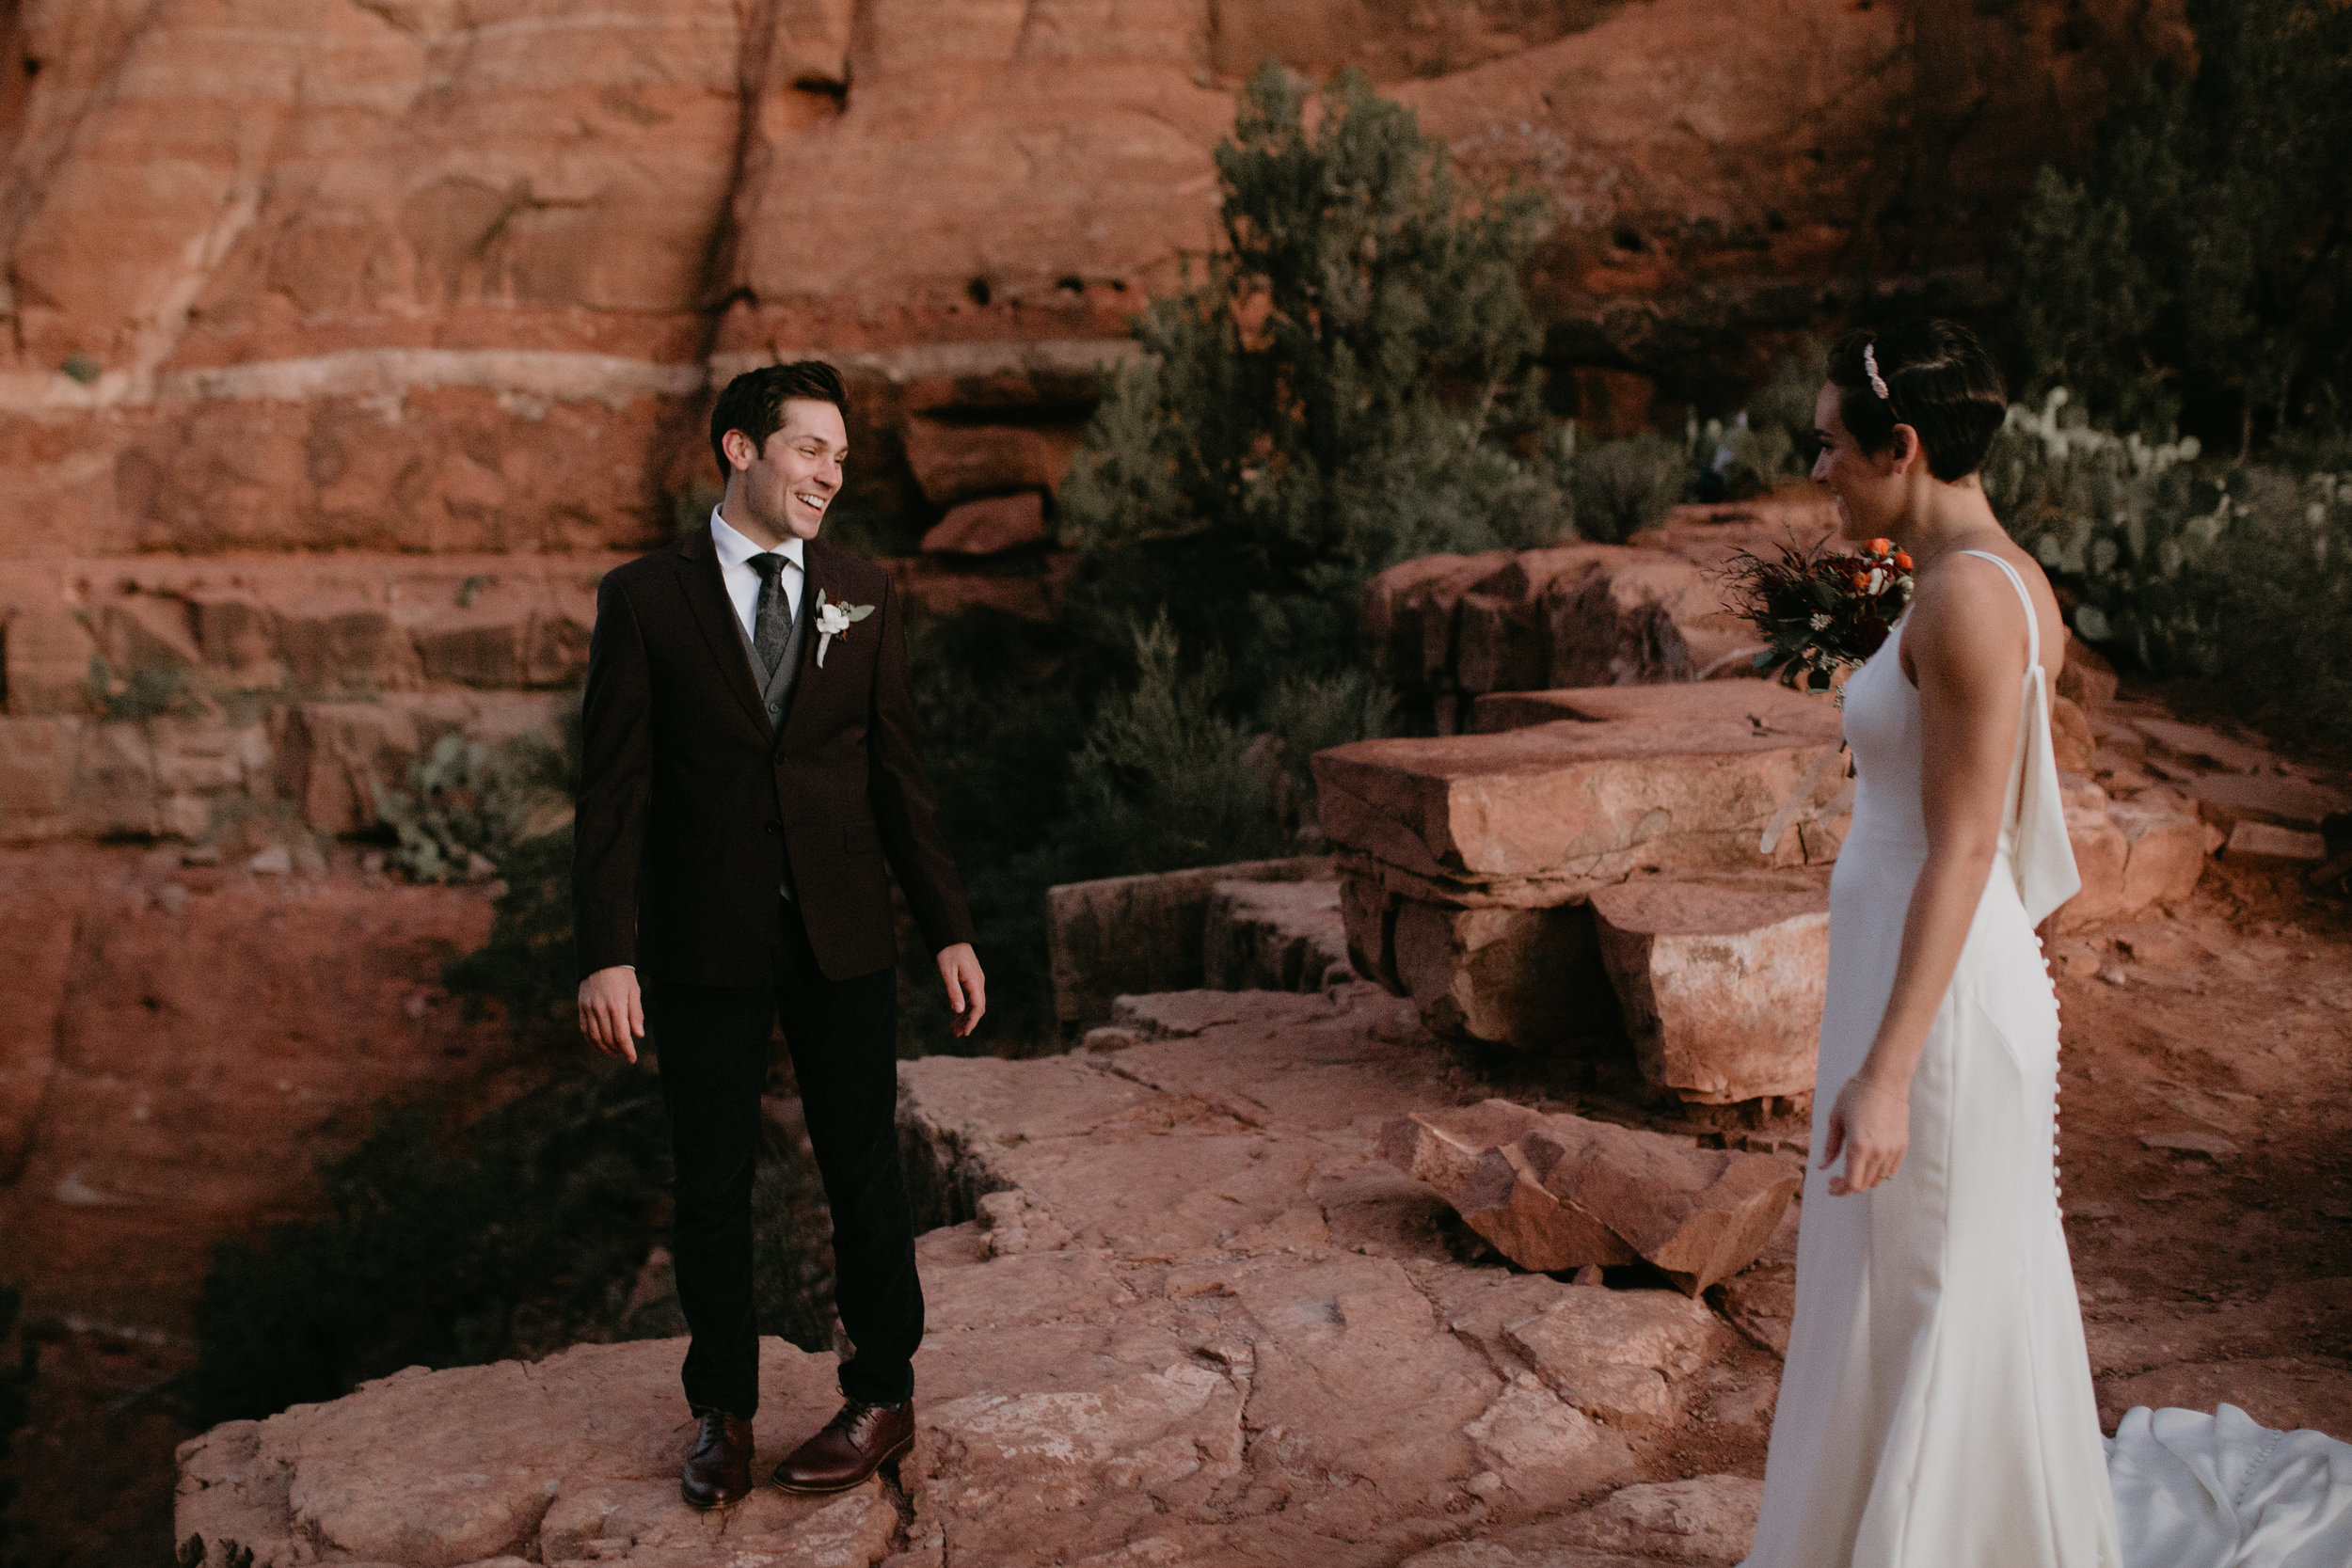 nicole-daacke-photography-sedona-arizona-destination-elopement-wedding-photographer-catherdral-rock-hiking-elopement-sedona-river-elopement-photos-desert-rock-wedding-photographer-laid-back-spontaneous-elopement-5.jpg